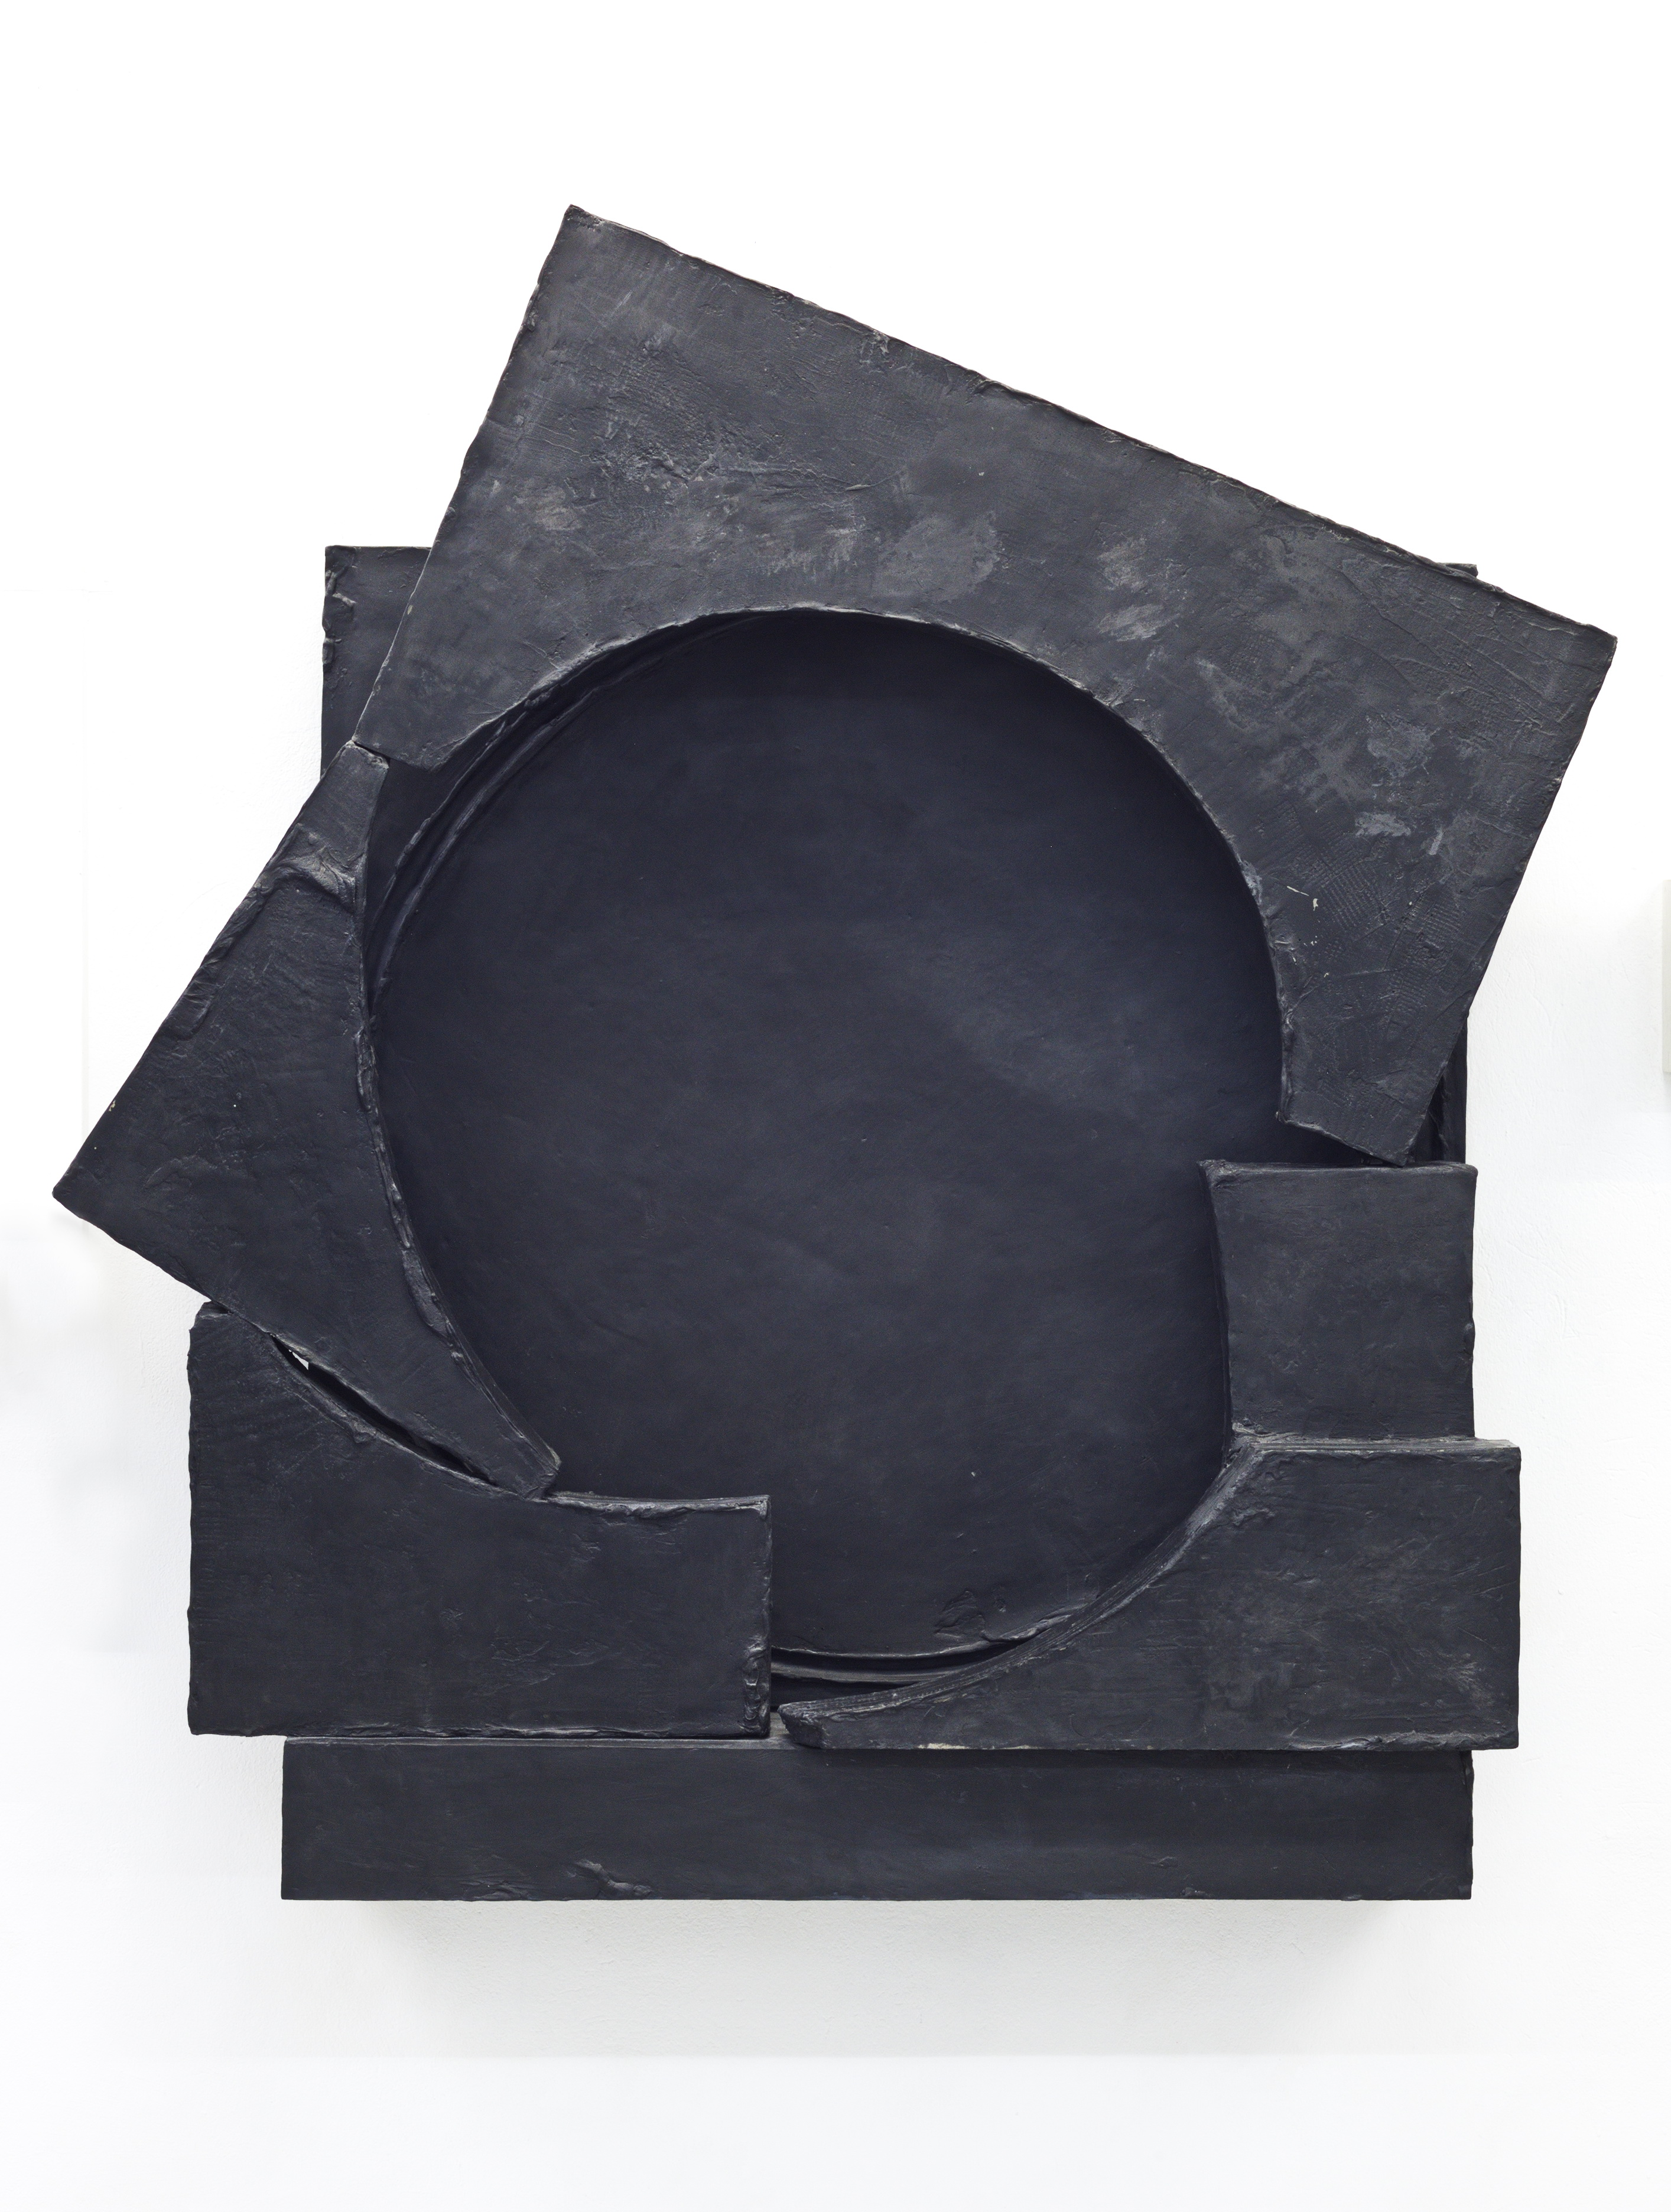 Artwork by Erik Andersen, Teresa, 2018, abstract skulpture made of epoxy resin and black pigment